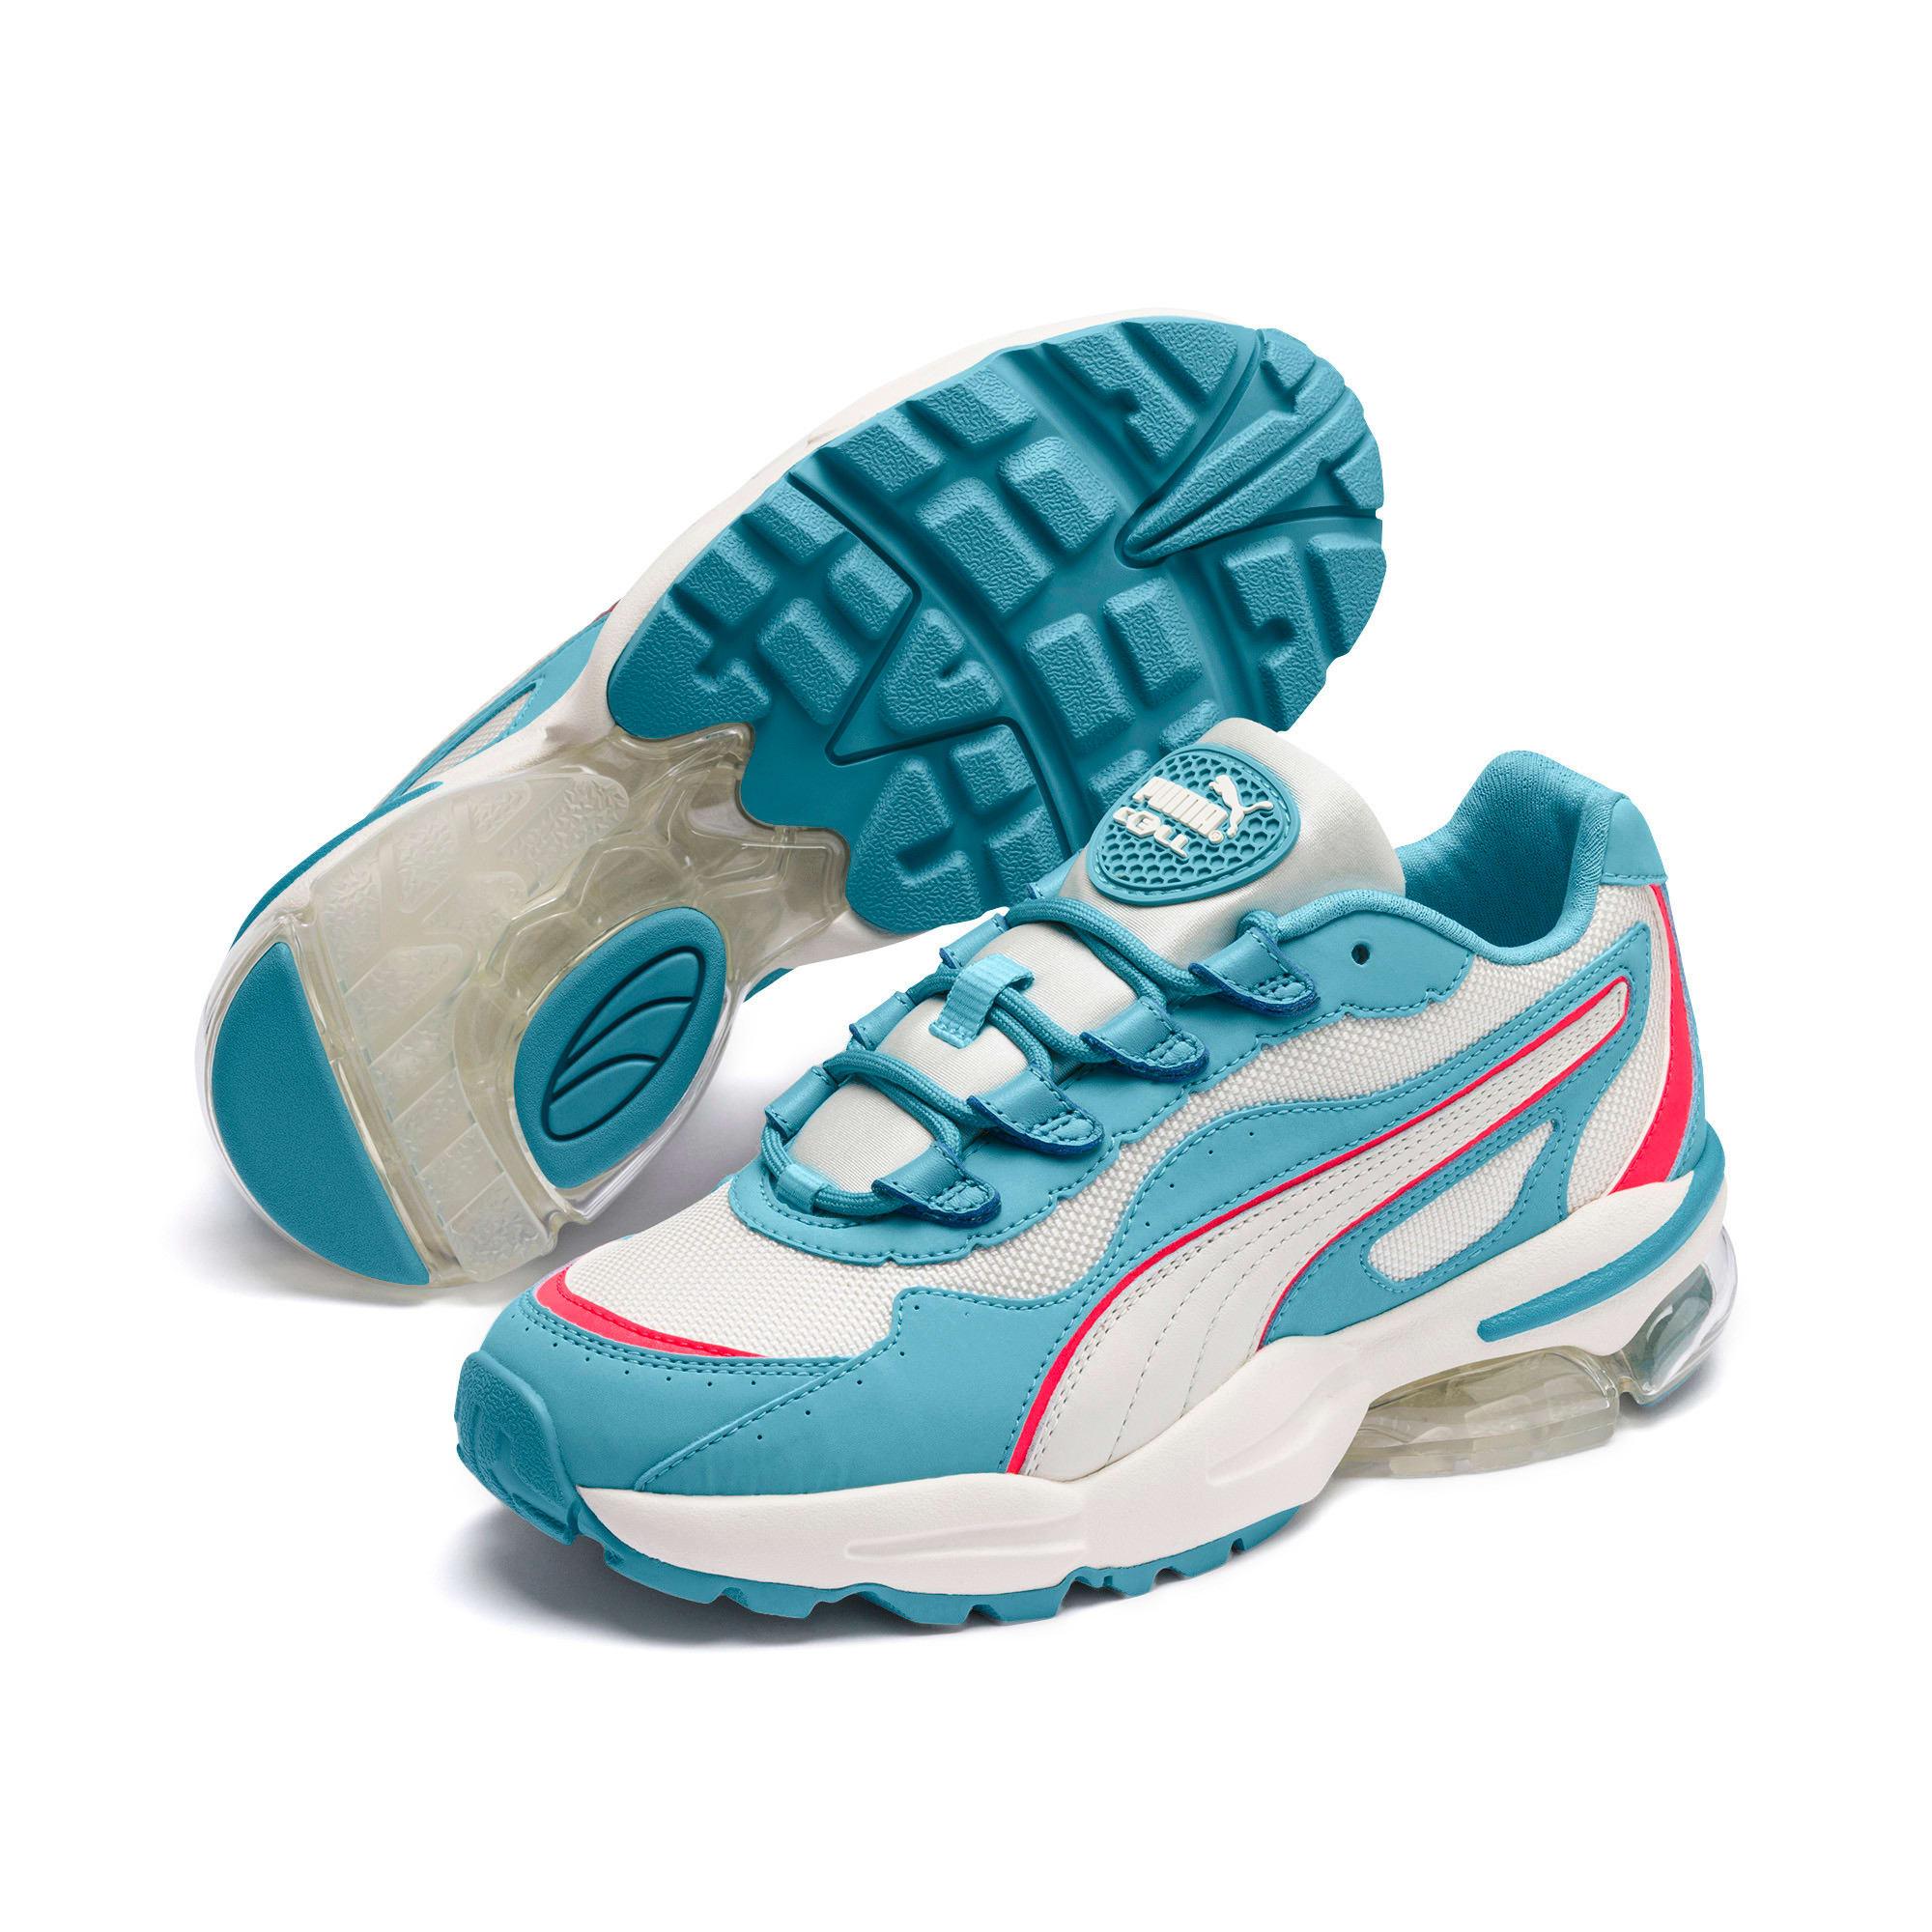 Thumbnail 3 of CELL Stellar Women's Sneakers, Milky Blue-Puma Team Gold, medium